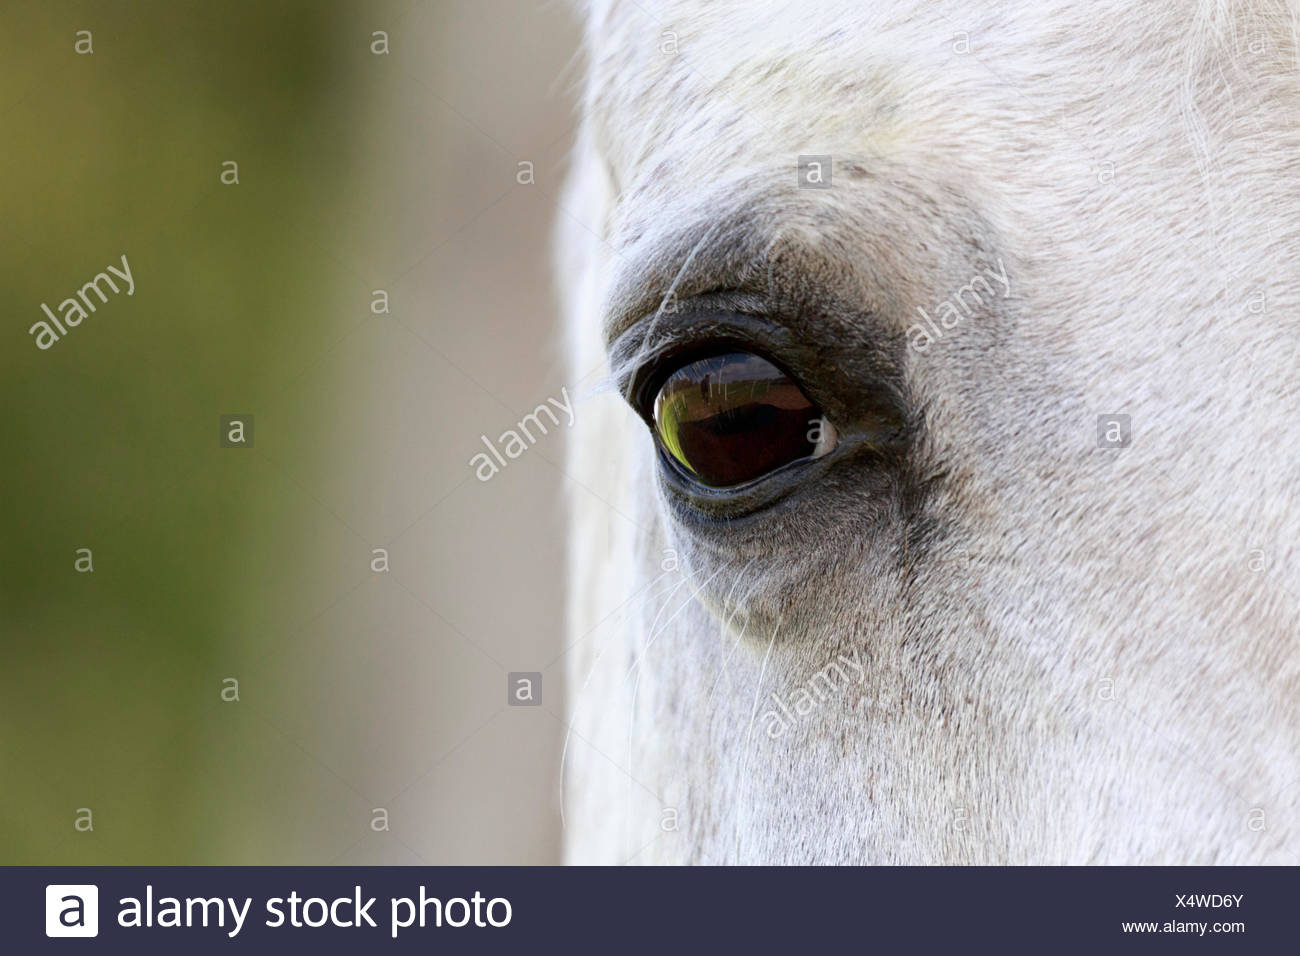 Arab Horse White Horse Mare Detail View Of The Eye North Rhine Westphalia Germany Stock Photo Alamy